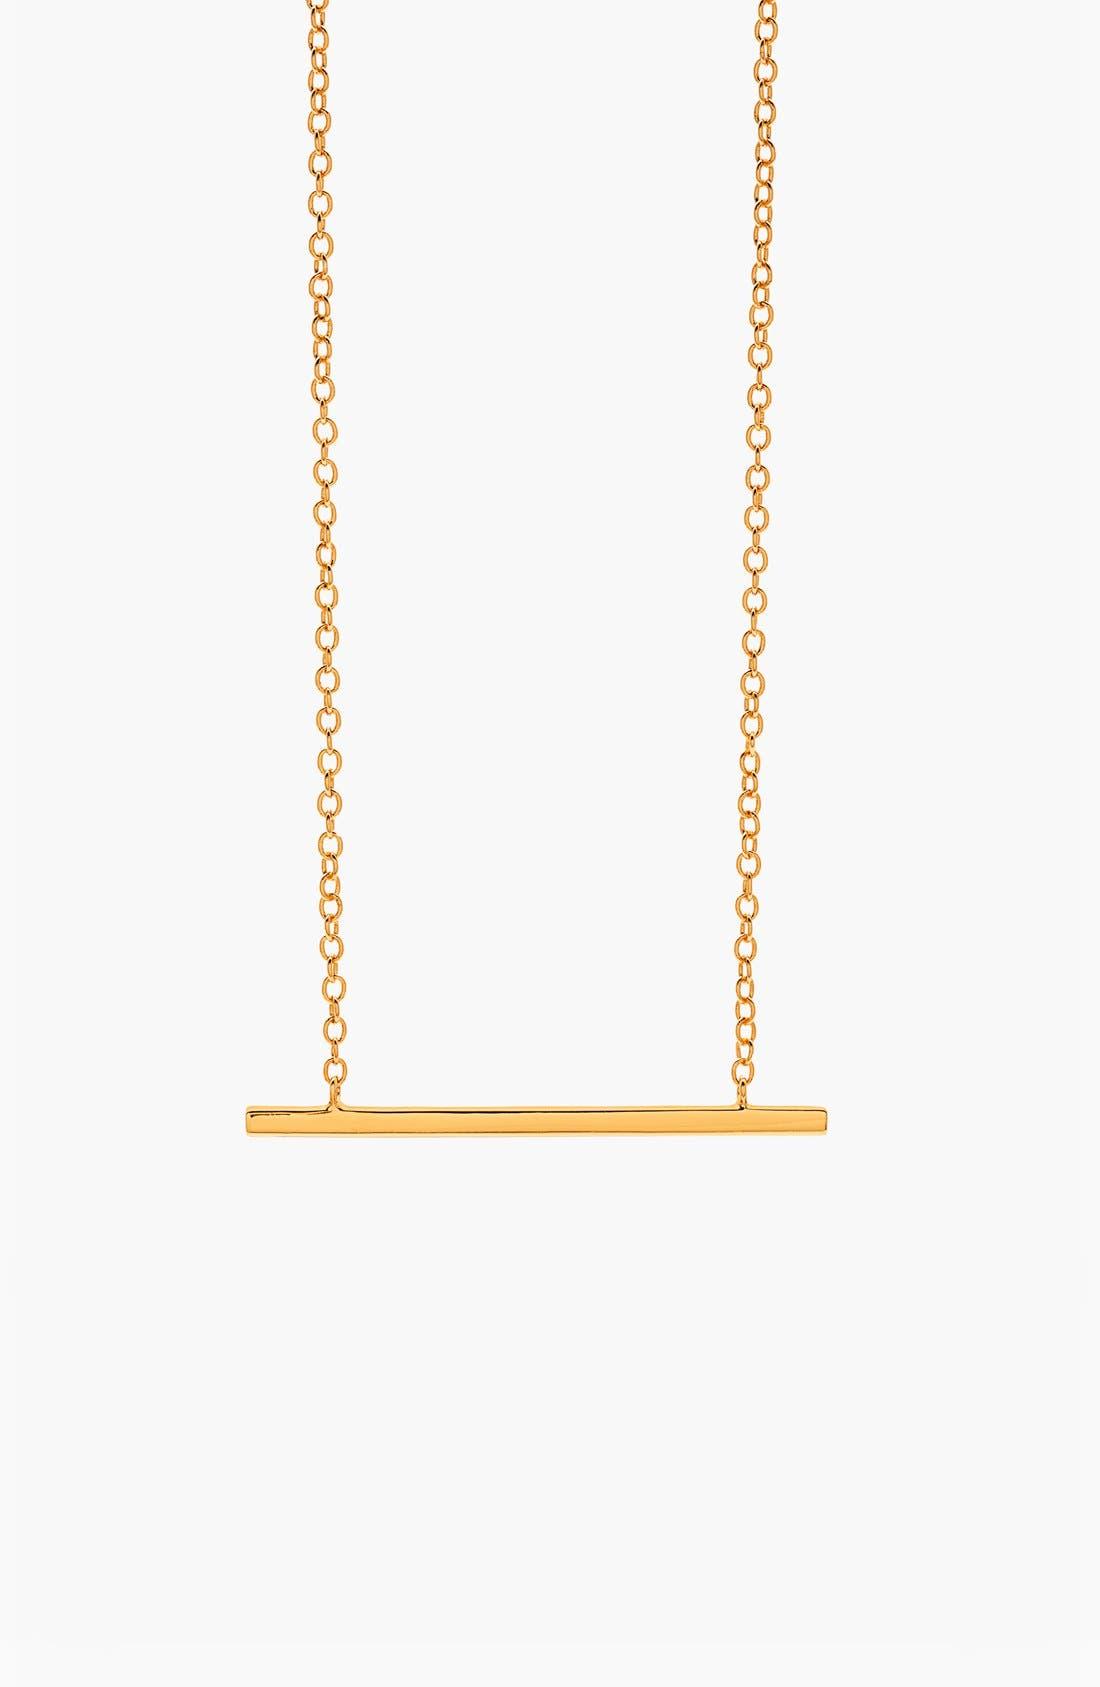 Alternate Image 1 Selected - gorjana 'Mave' Bar Pendant Necklace